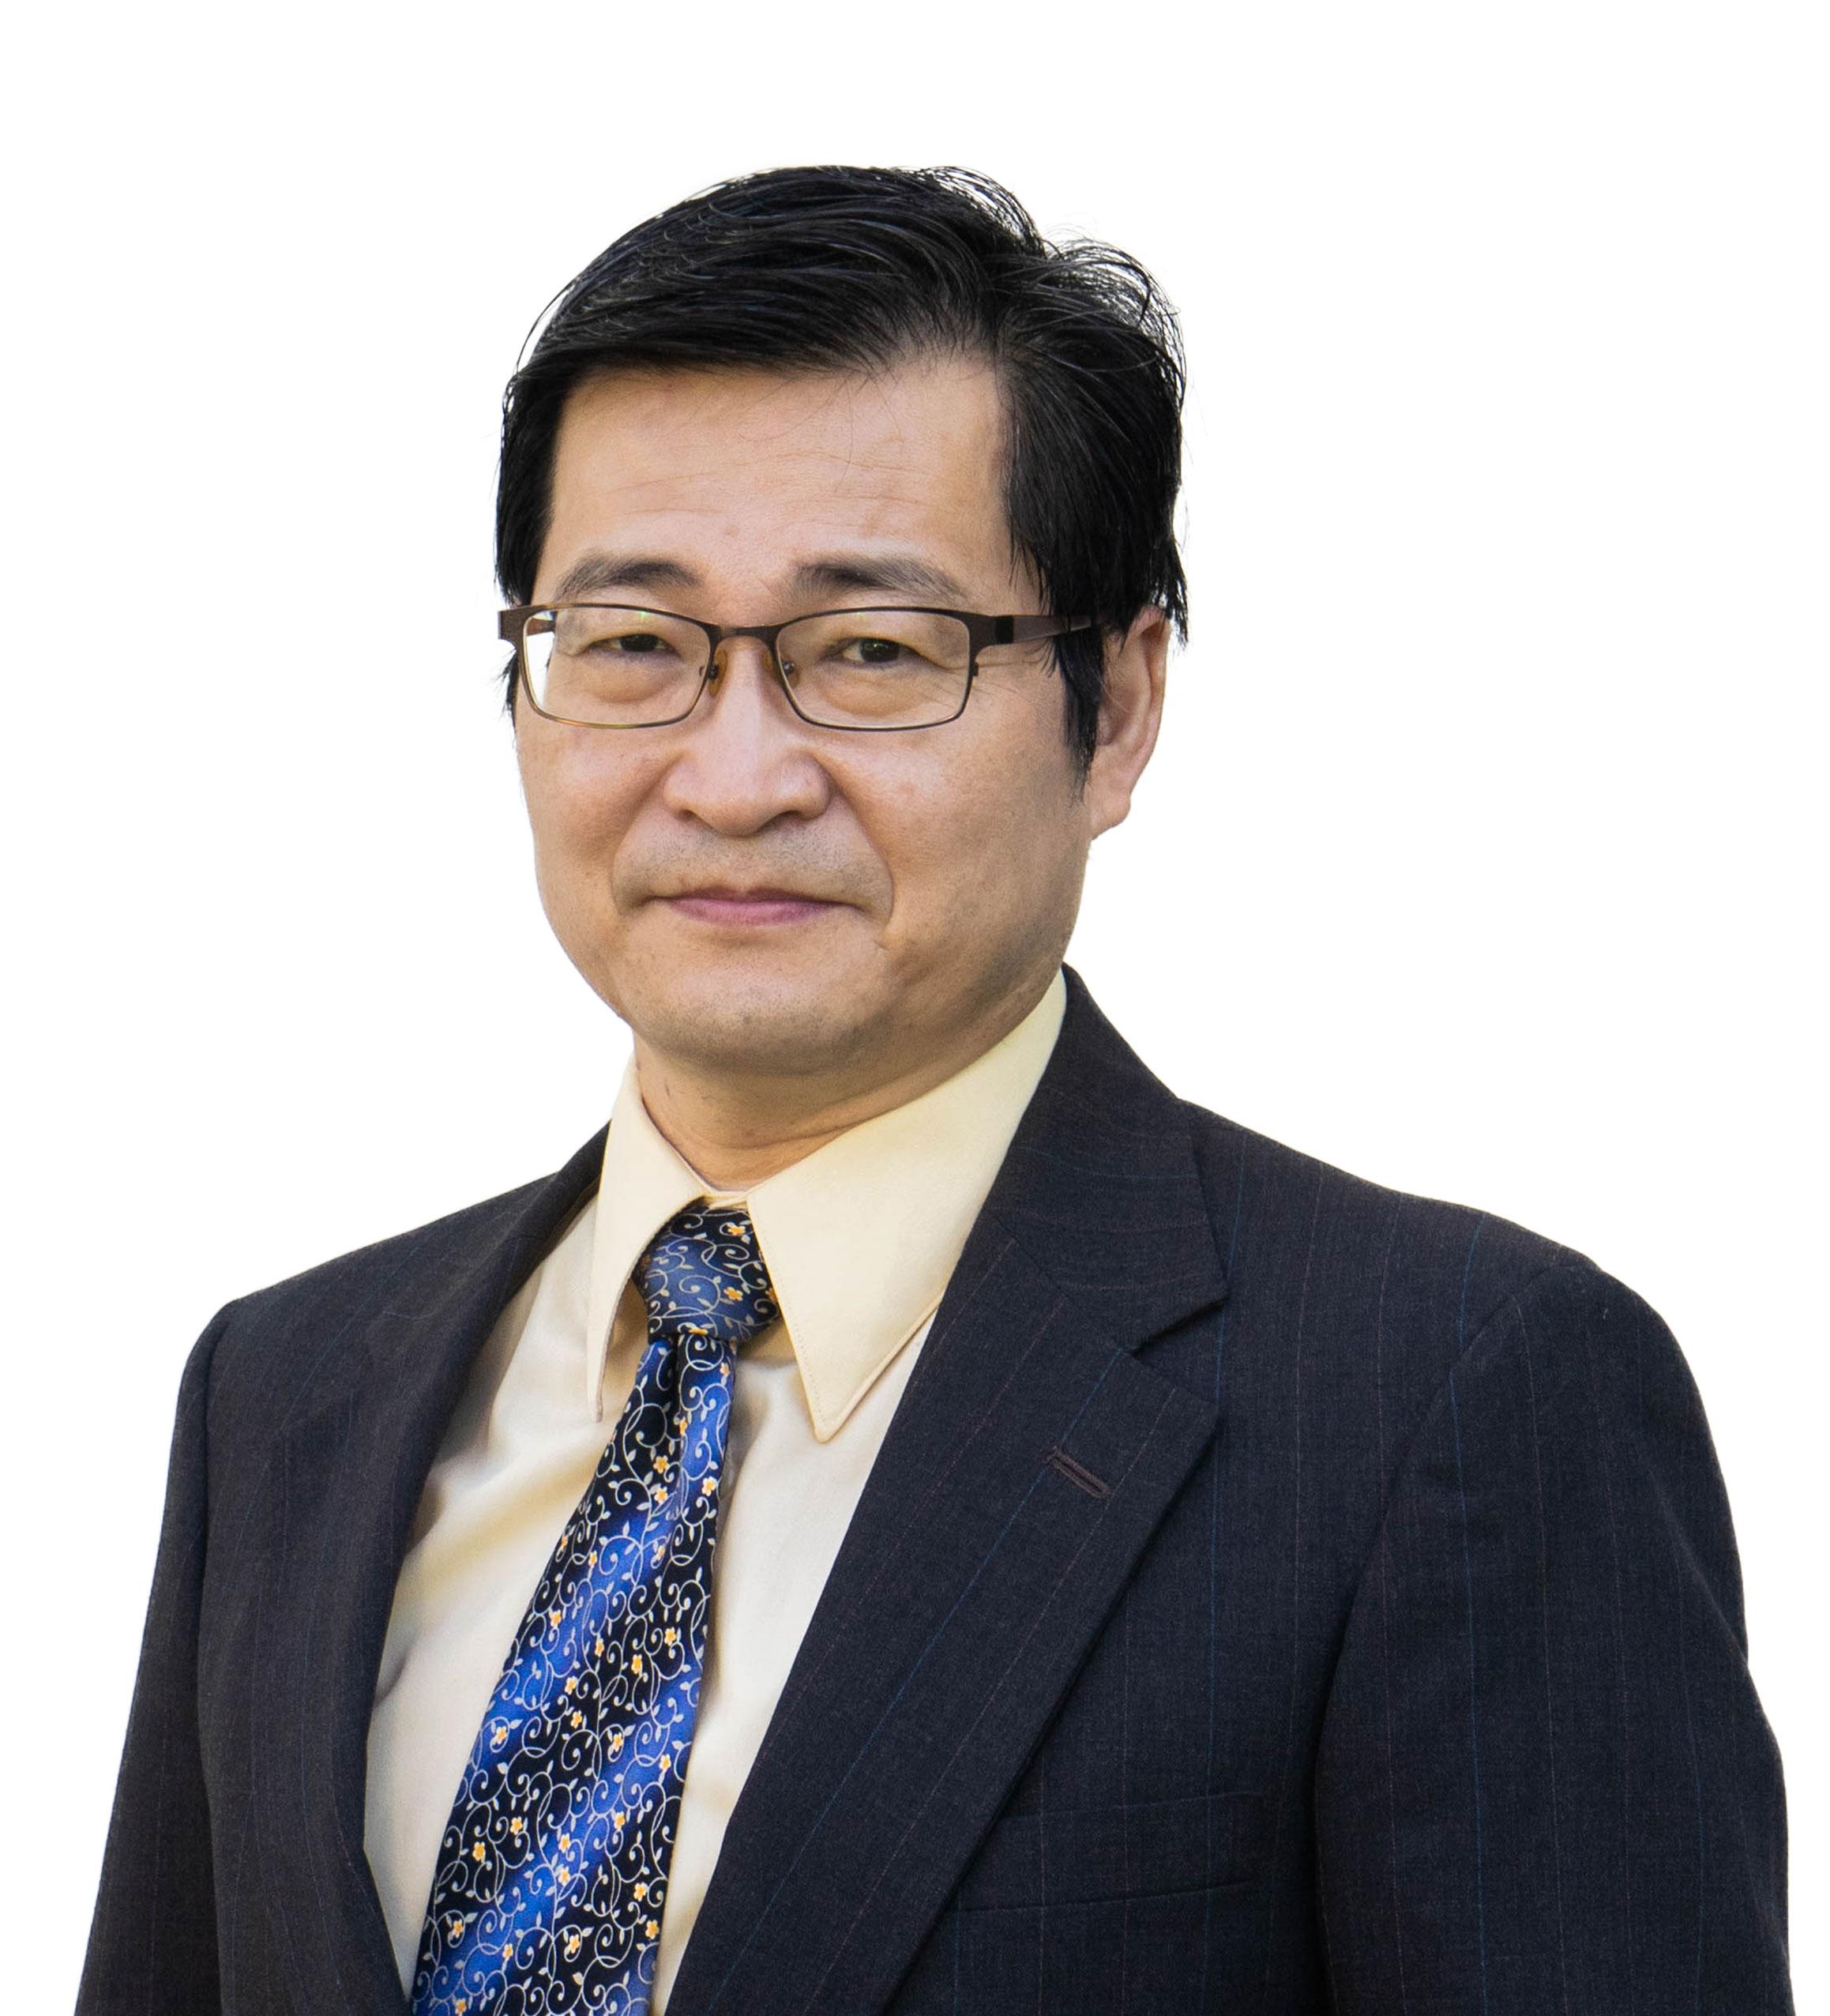 Dr. Jeong Jae Woo